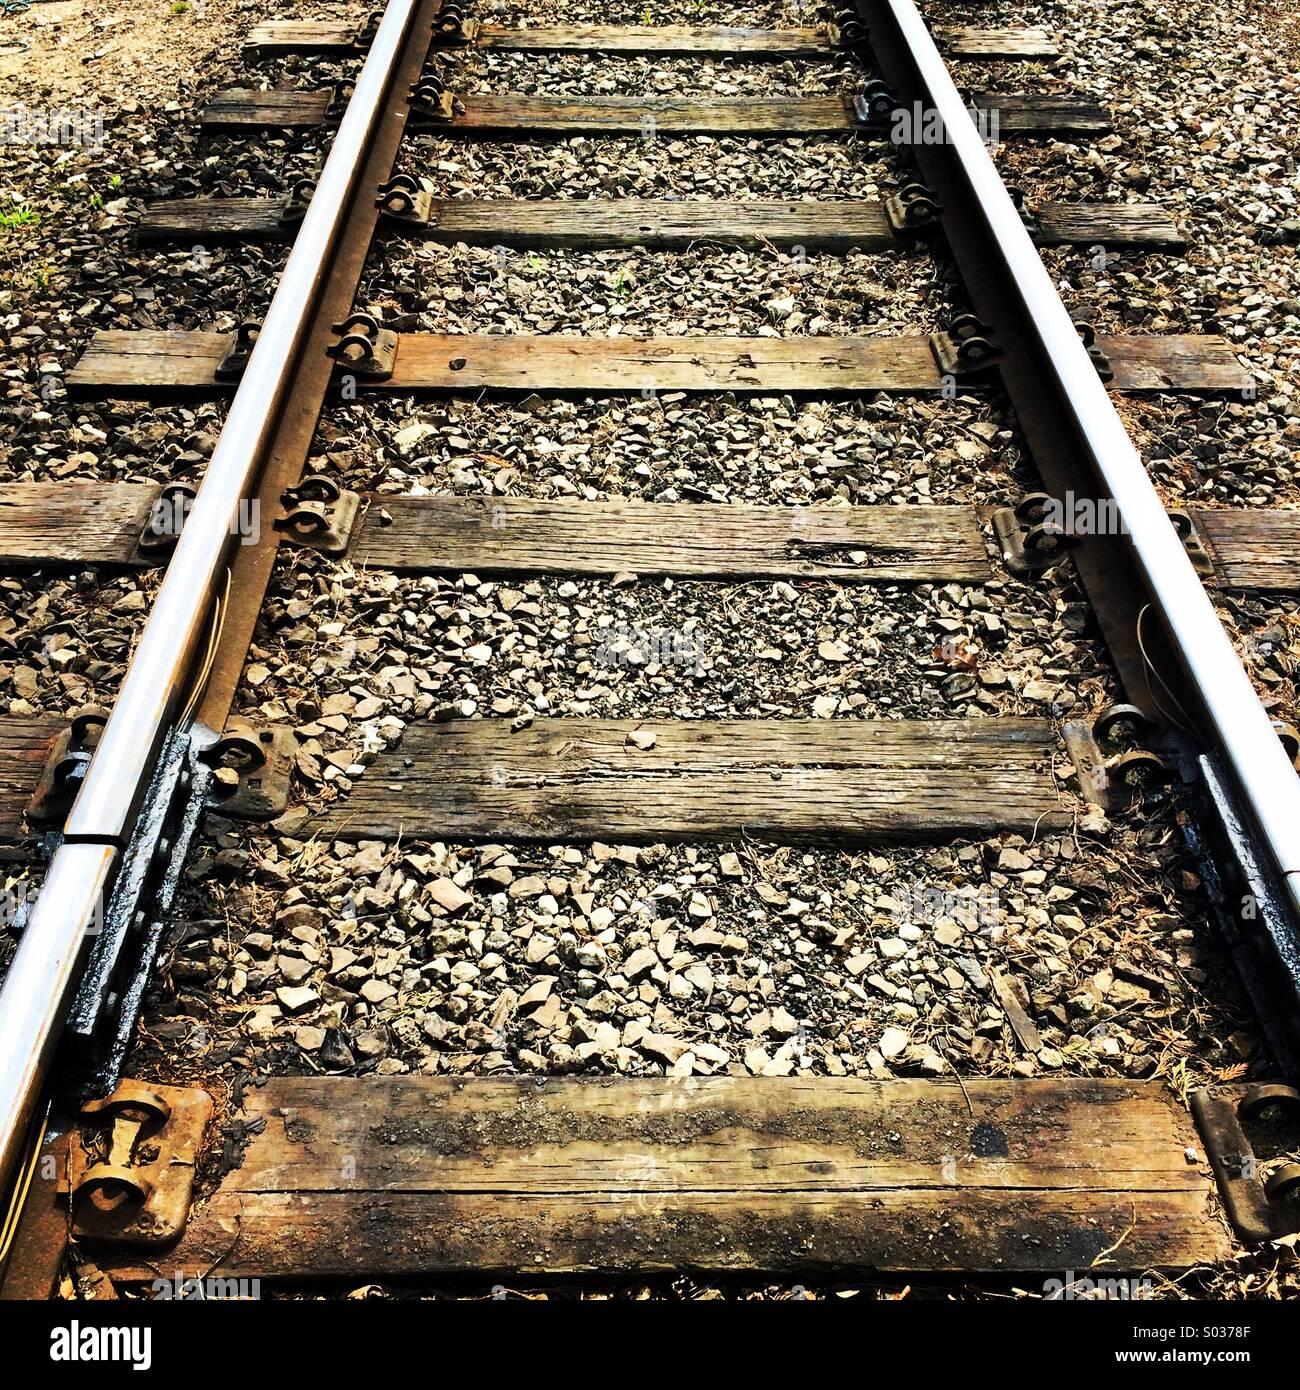 Train track. - Stock Image